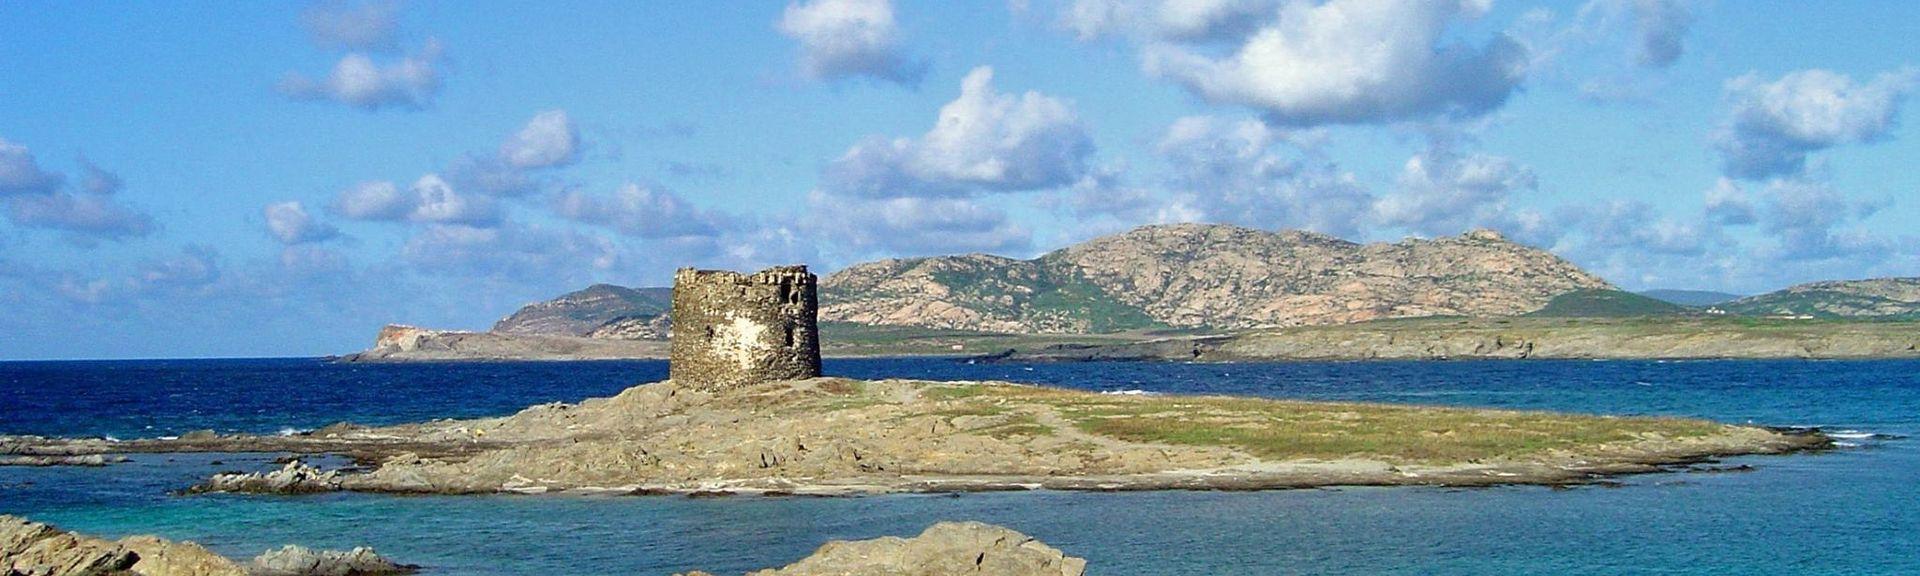 La Pelosa, Stintino, Sardegna, Italia